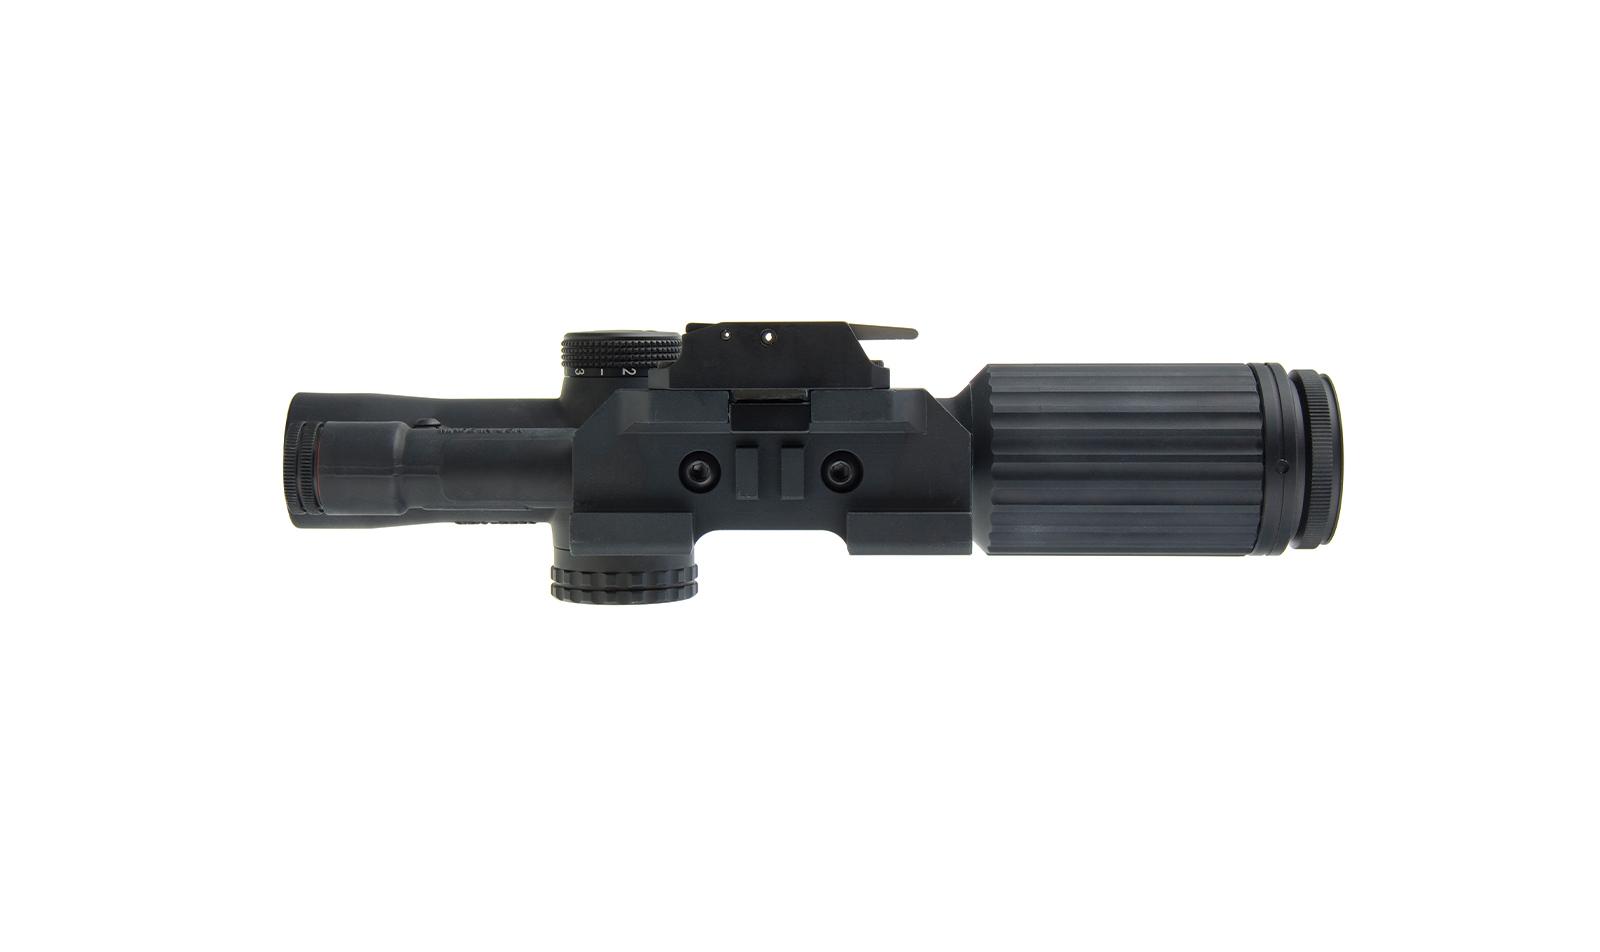 VC16-C-1600013 angle 10